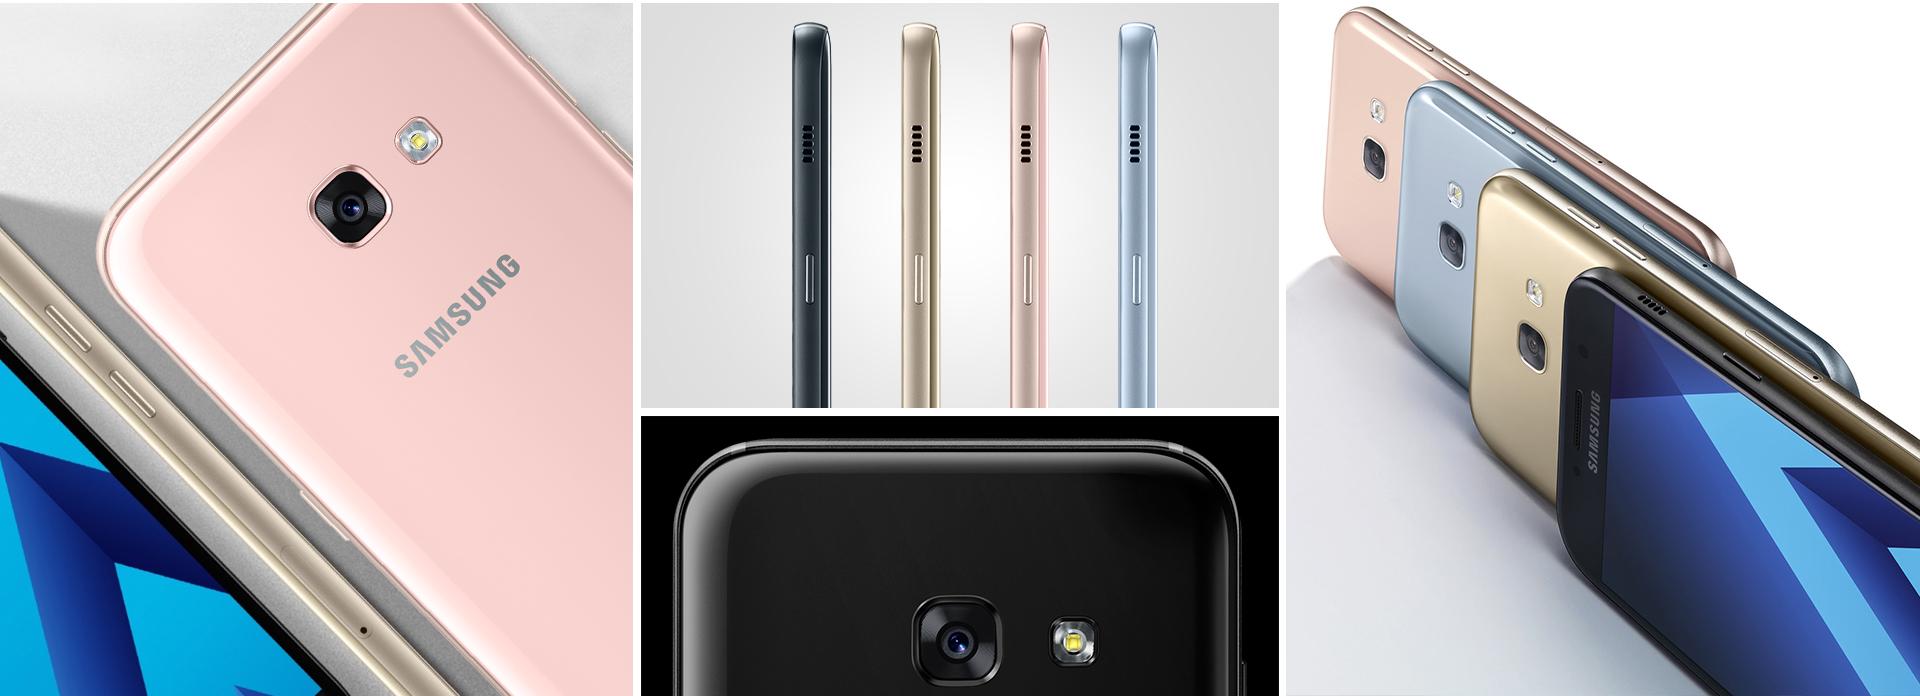 Samsung Samsung A3 2017 Kolaz